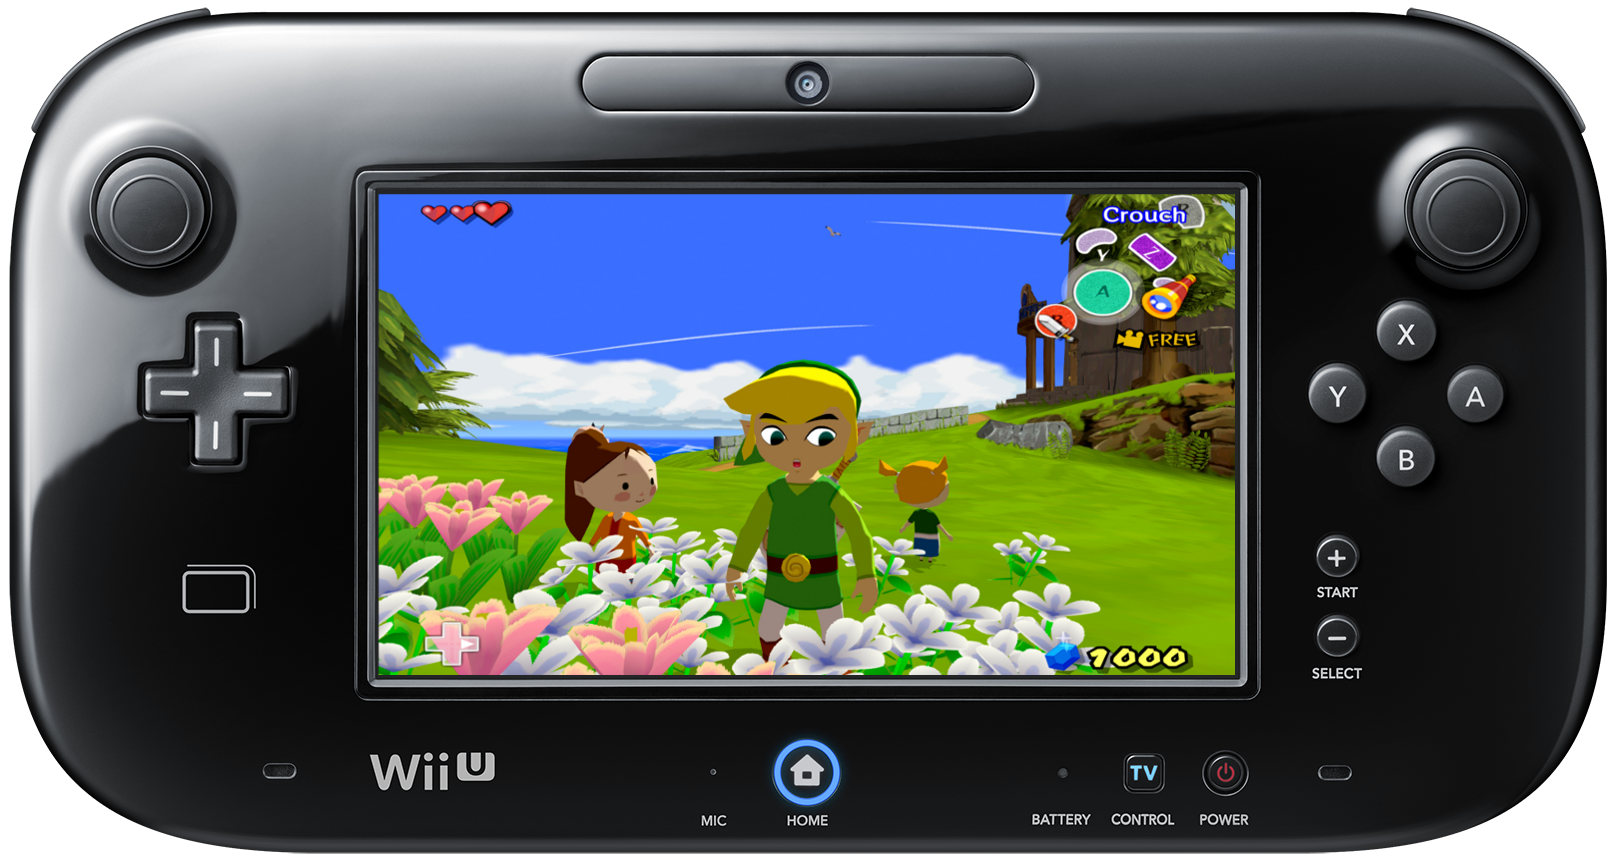 Bundles De #Wii U 32GB De #Zelda Wind Waker HD y #3DS XL de #Pokemon Se Encaminan